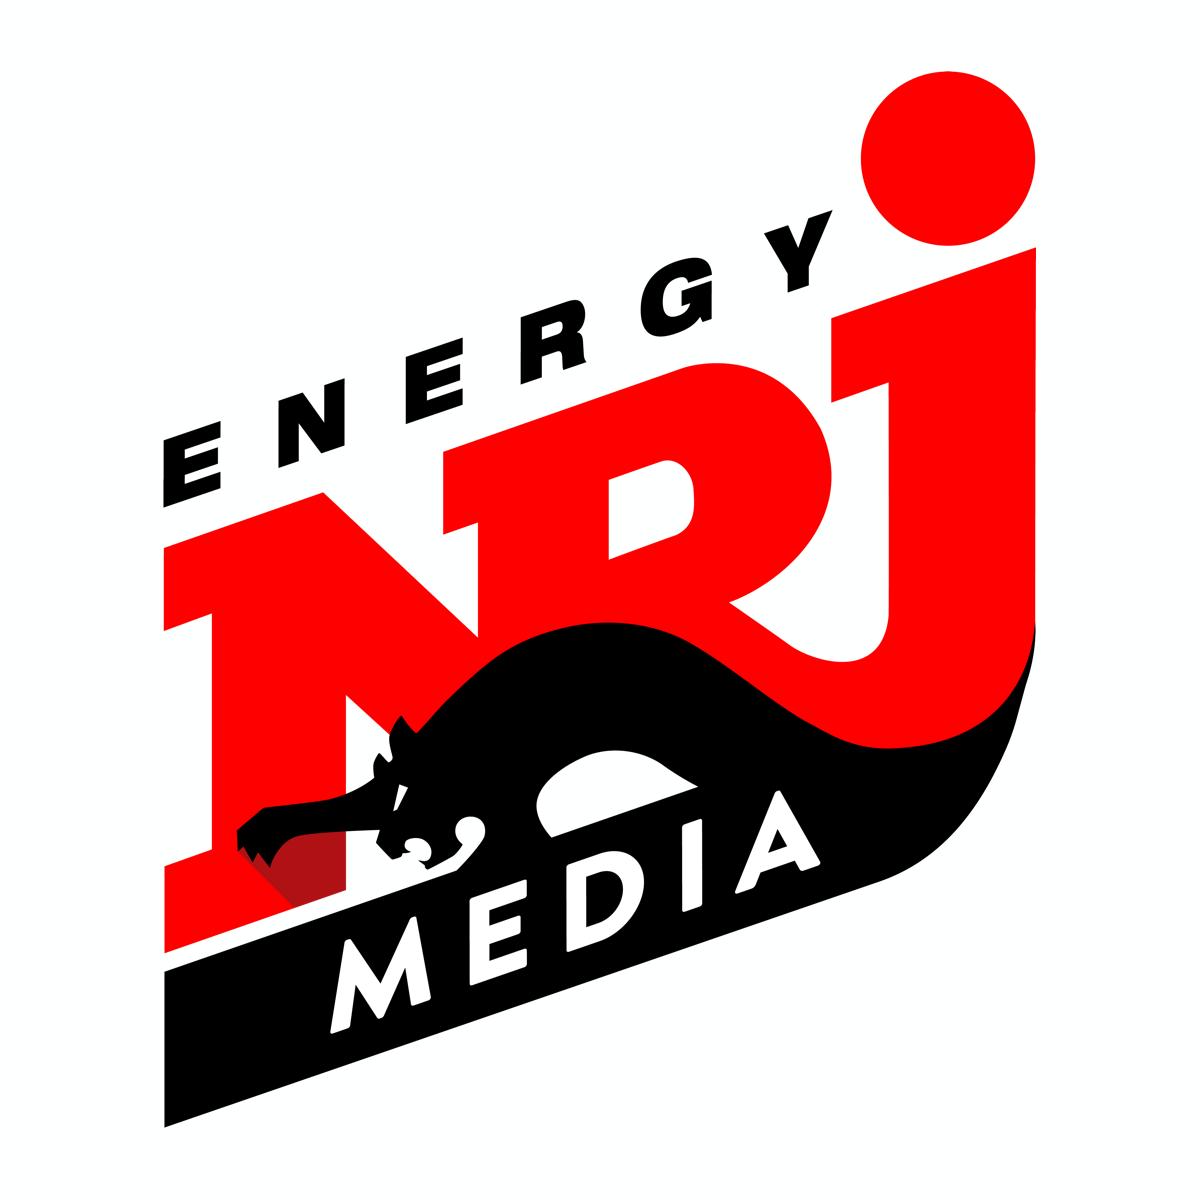 ENERGY Media